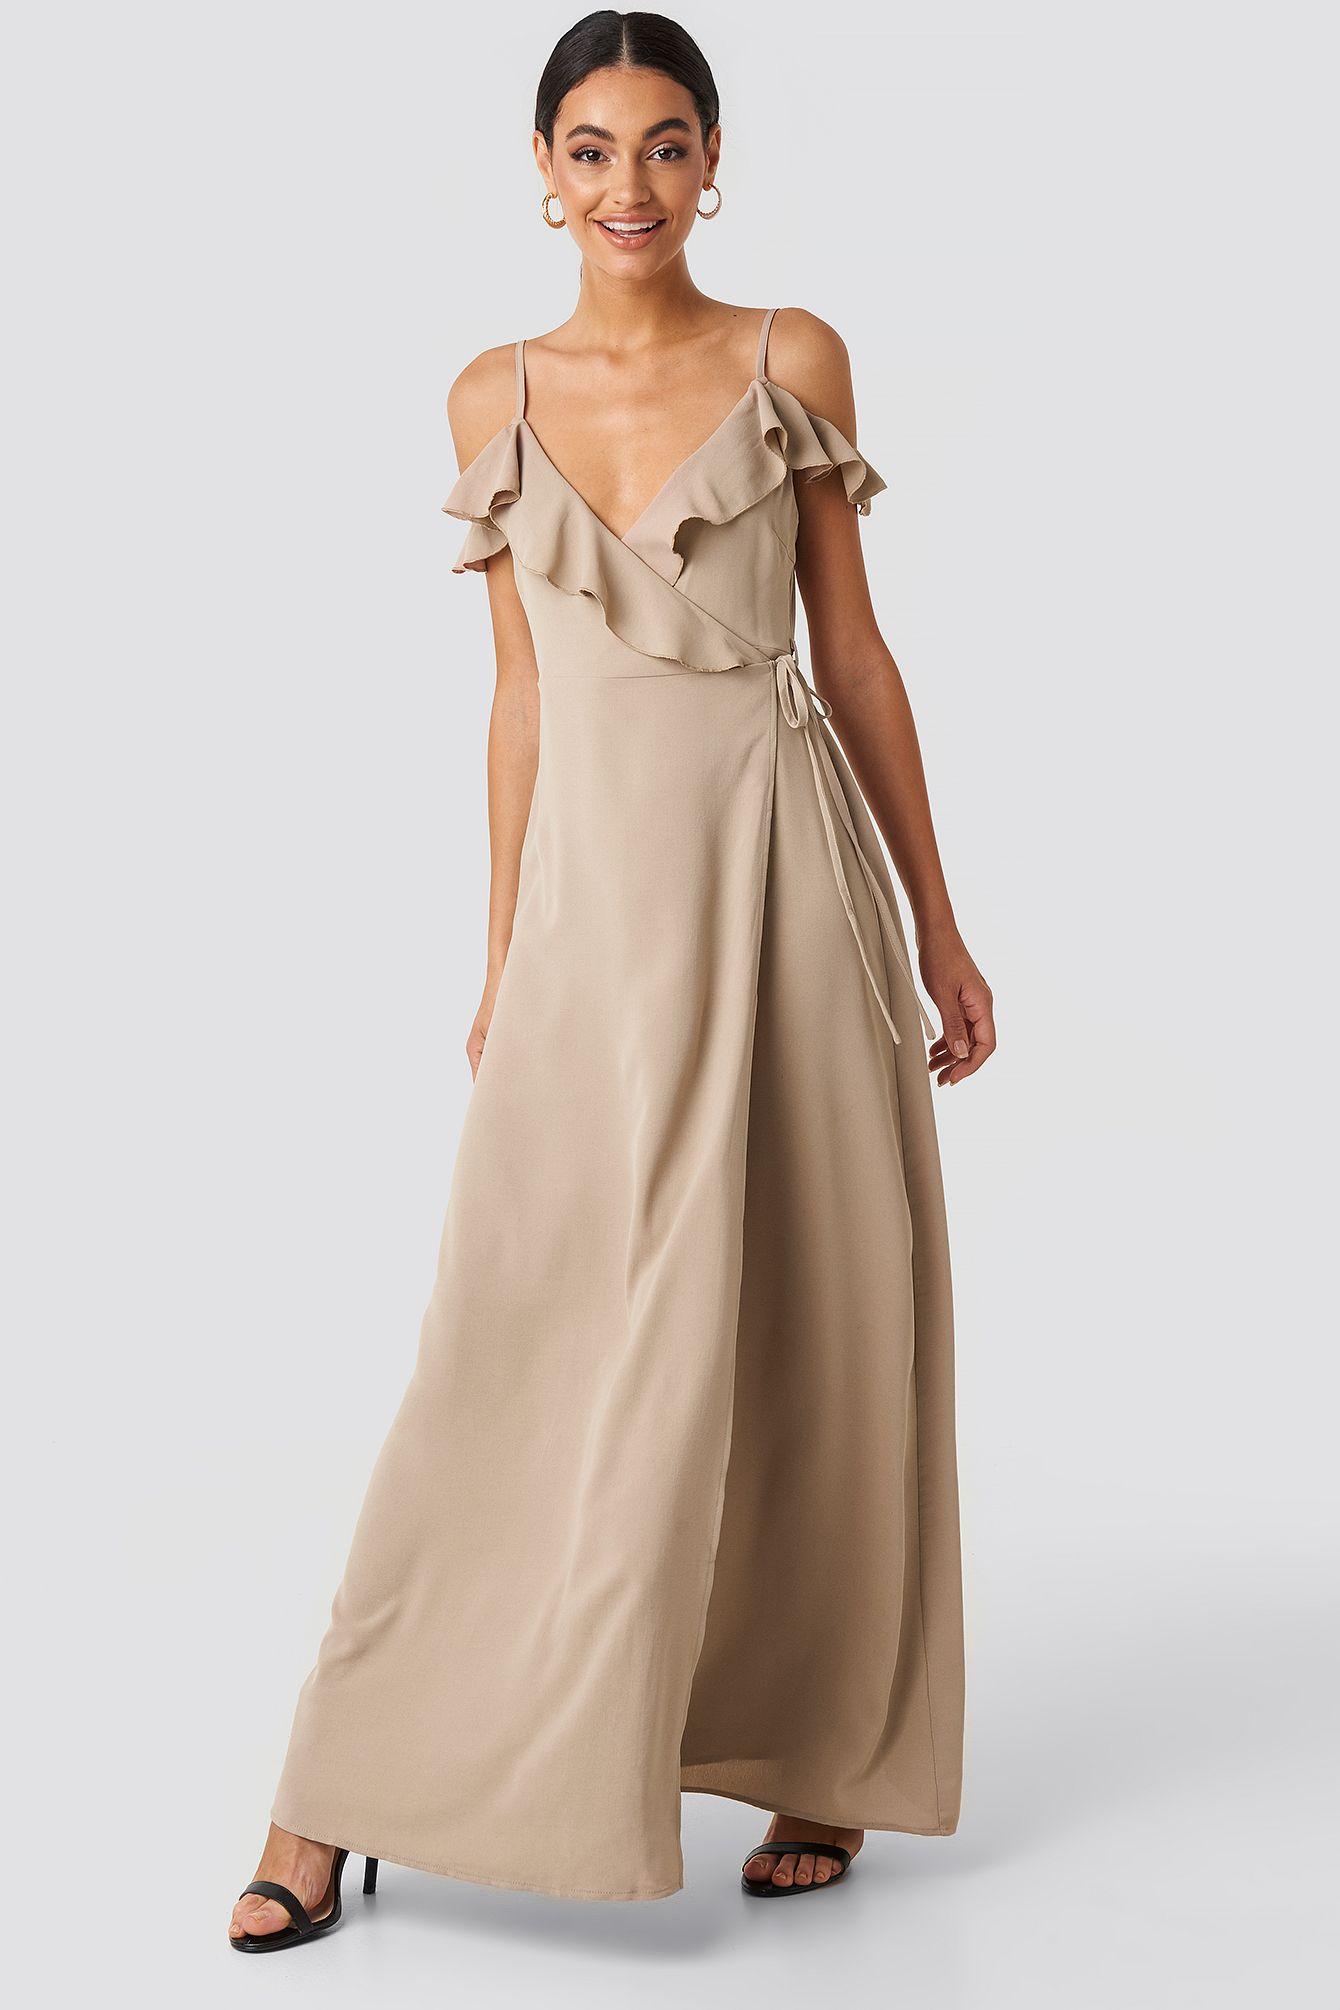 Frill Strap Maxi Dress in 14  Maxi kleider, Glamour, Kleidung